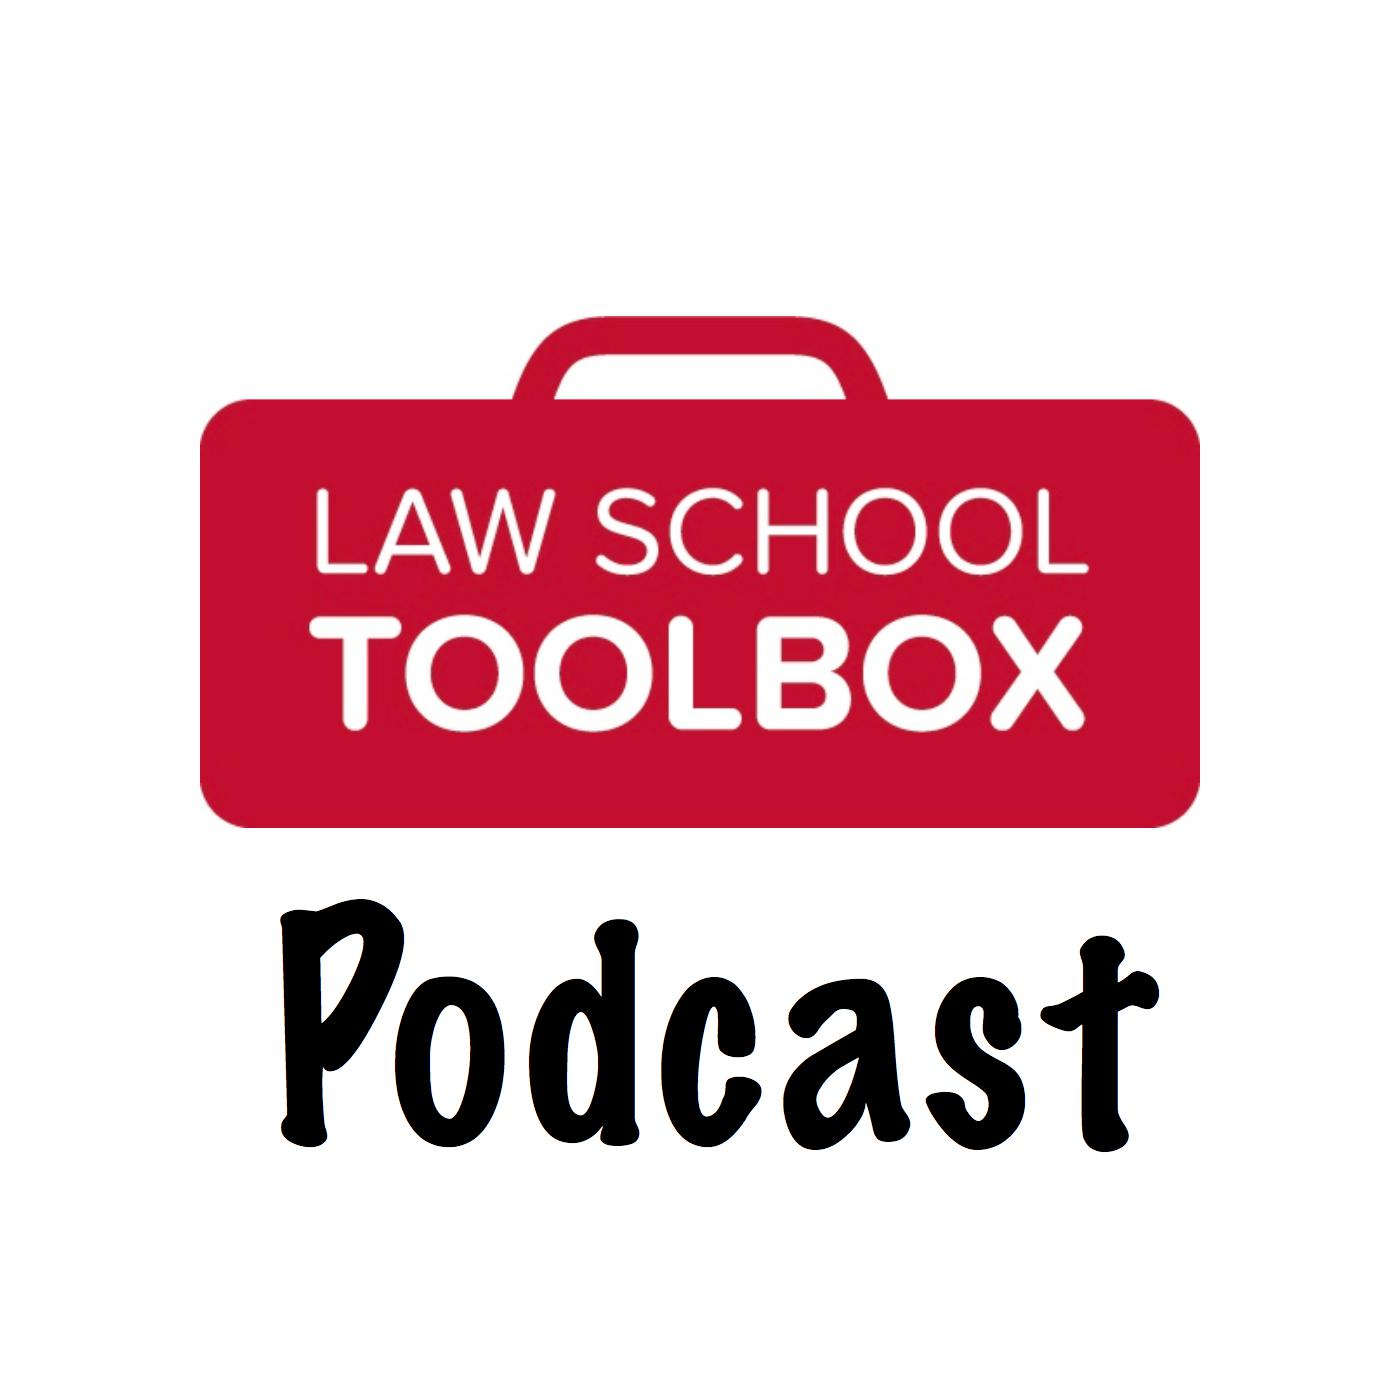 152: Top OCI Mistakes to Avoid (w/Sadie Jones) - The Law